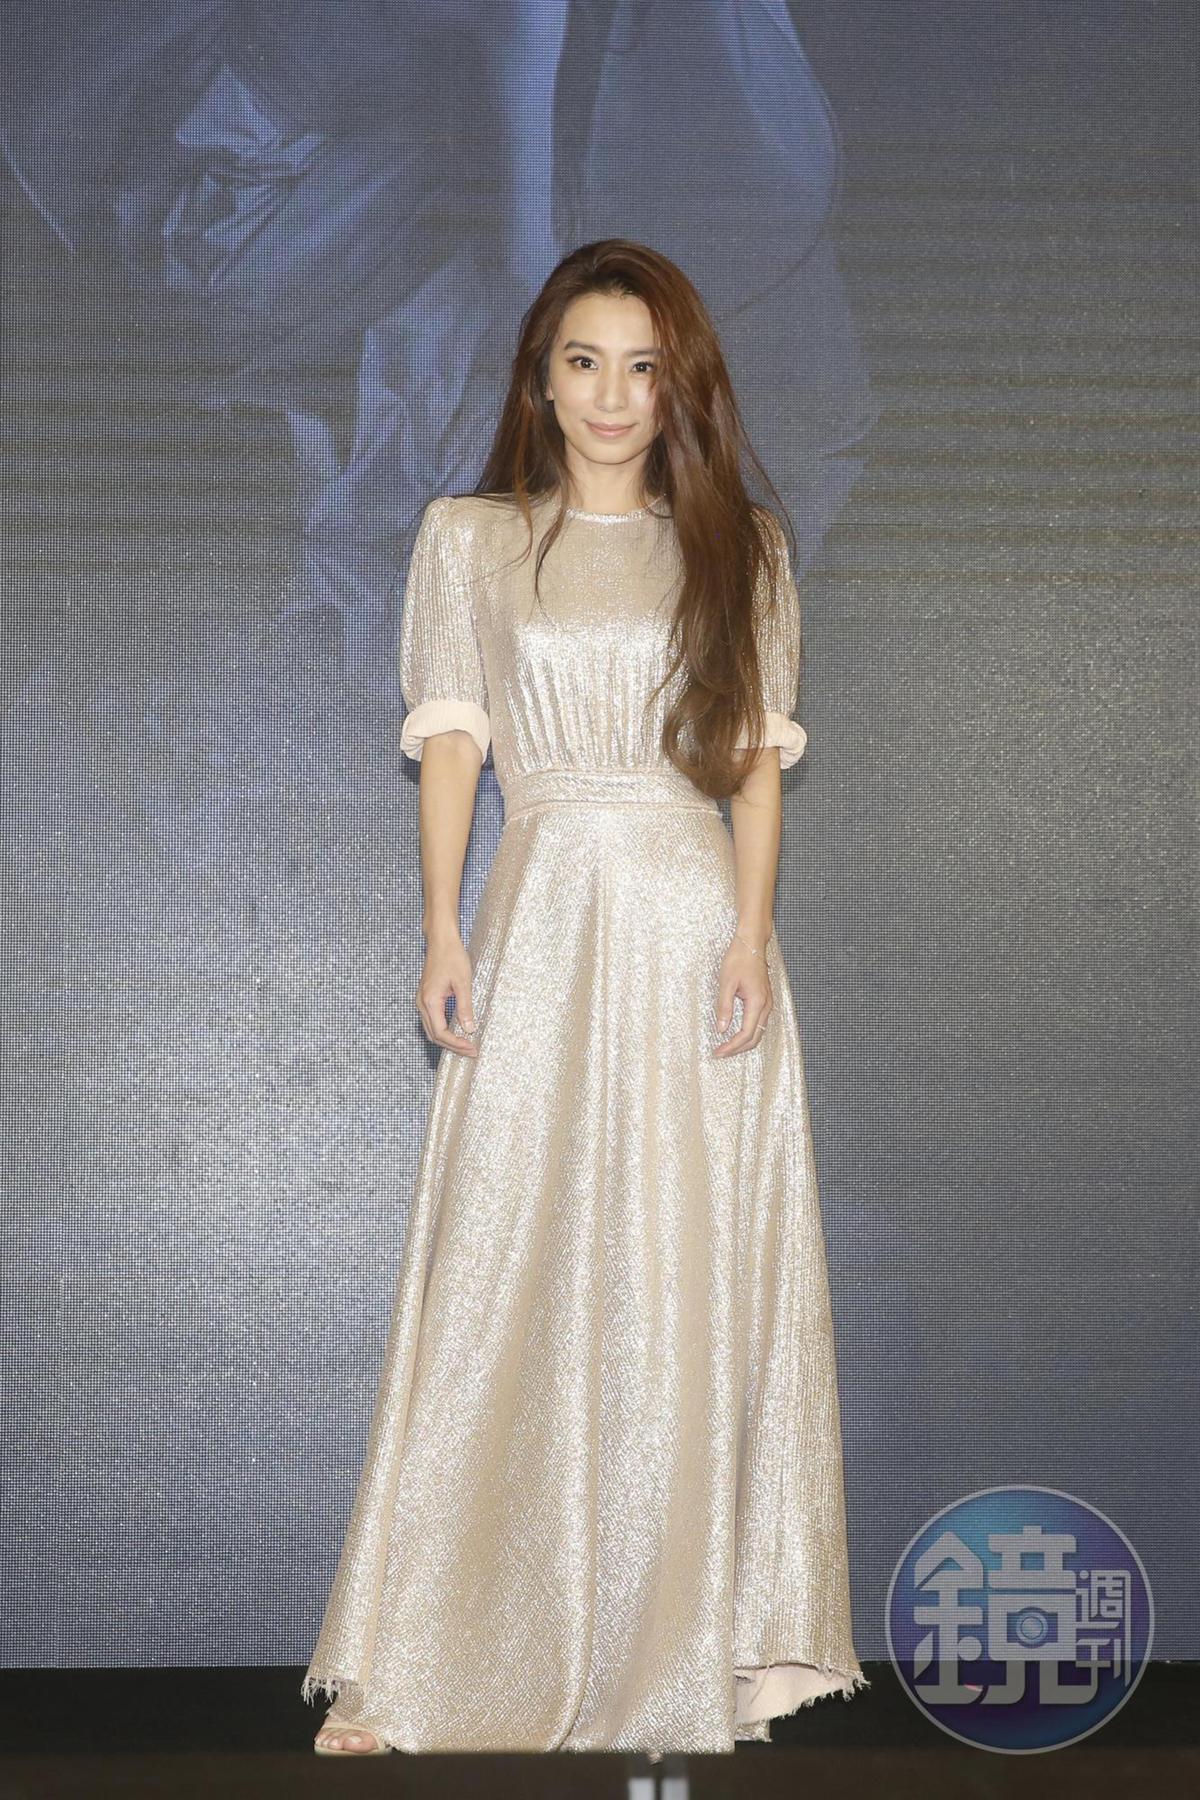 Hebe田馥甄舉辦演唱會,也將同時推出新專輯。